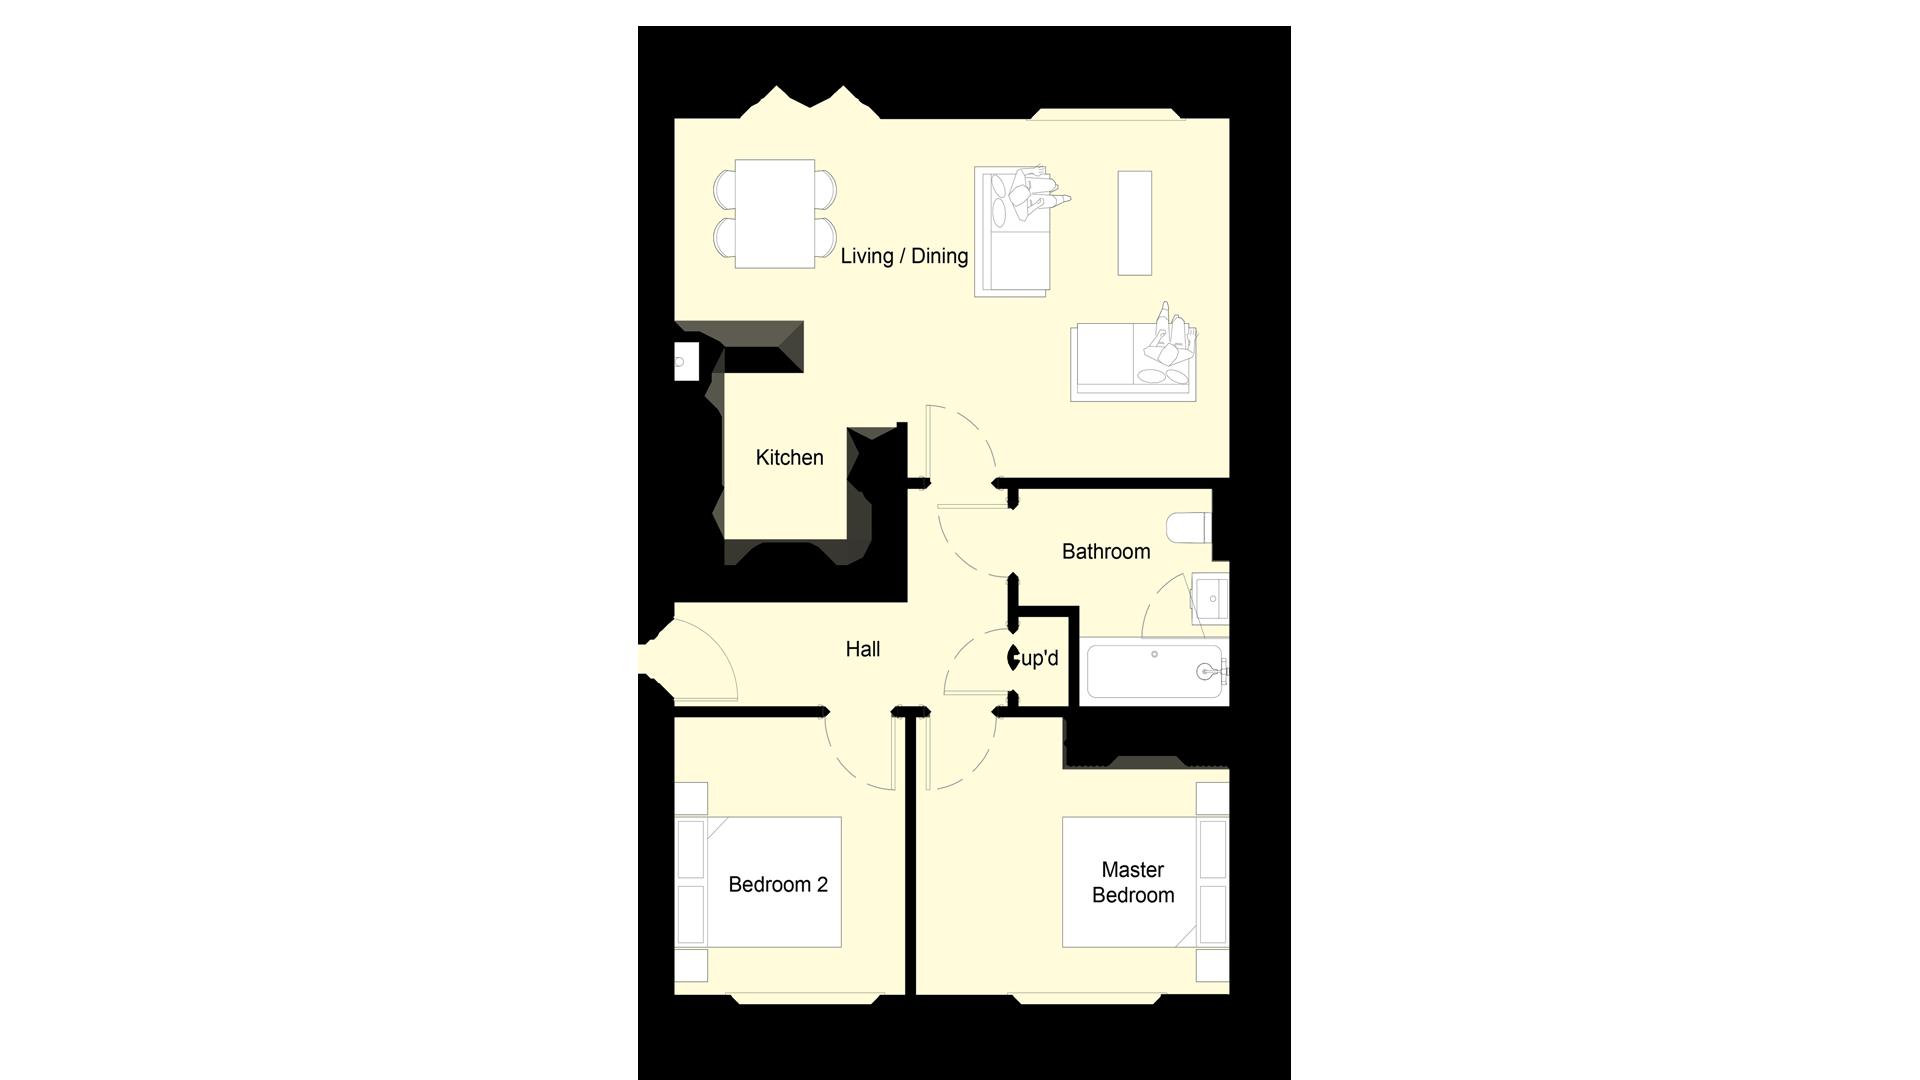 Layout of the ground floor at Churchfields plot 5 sales plan